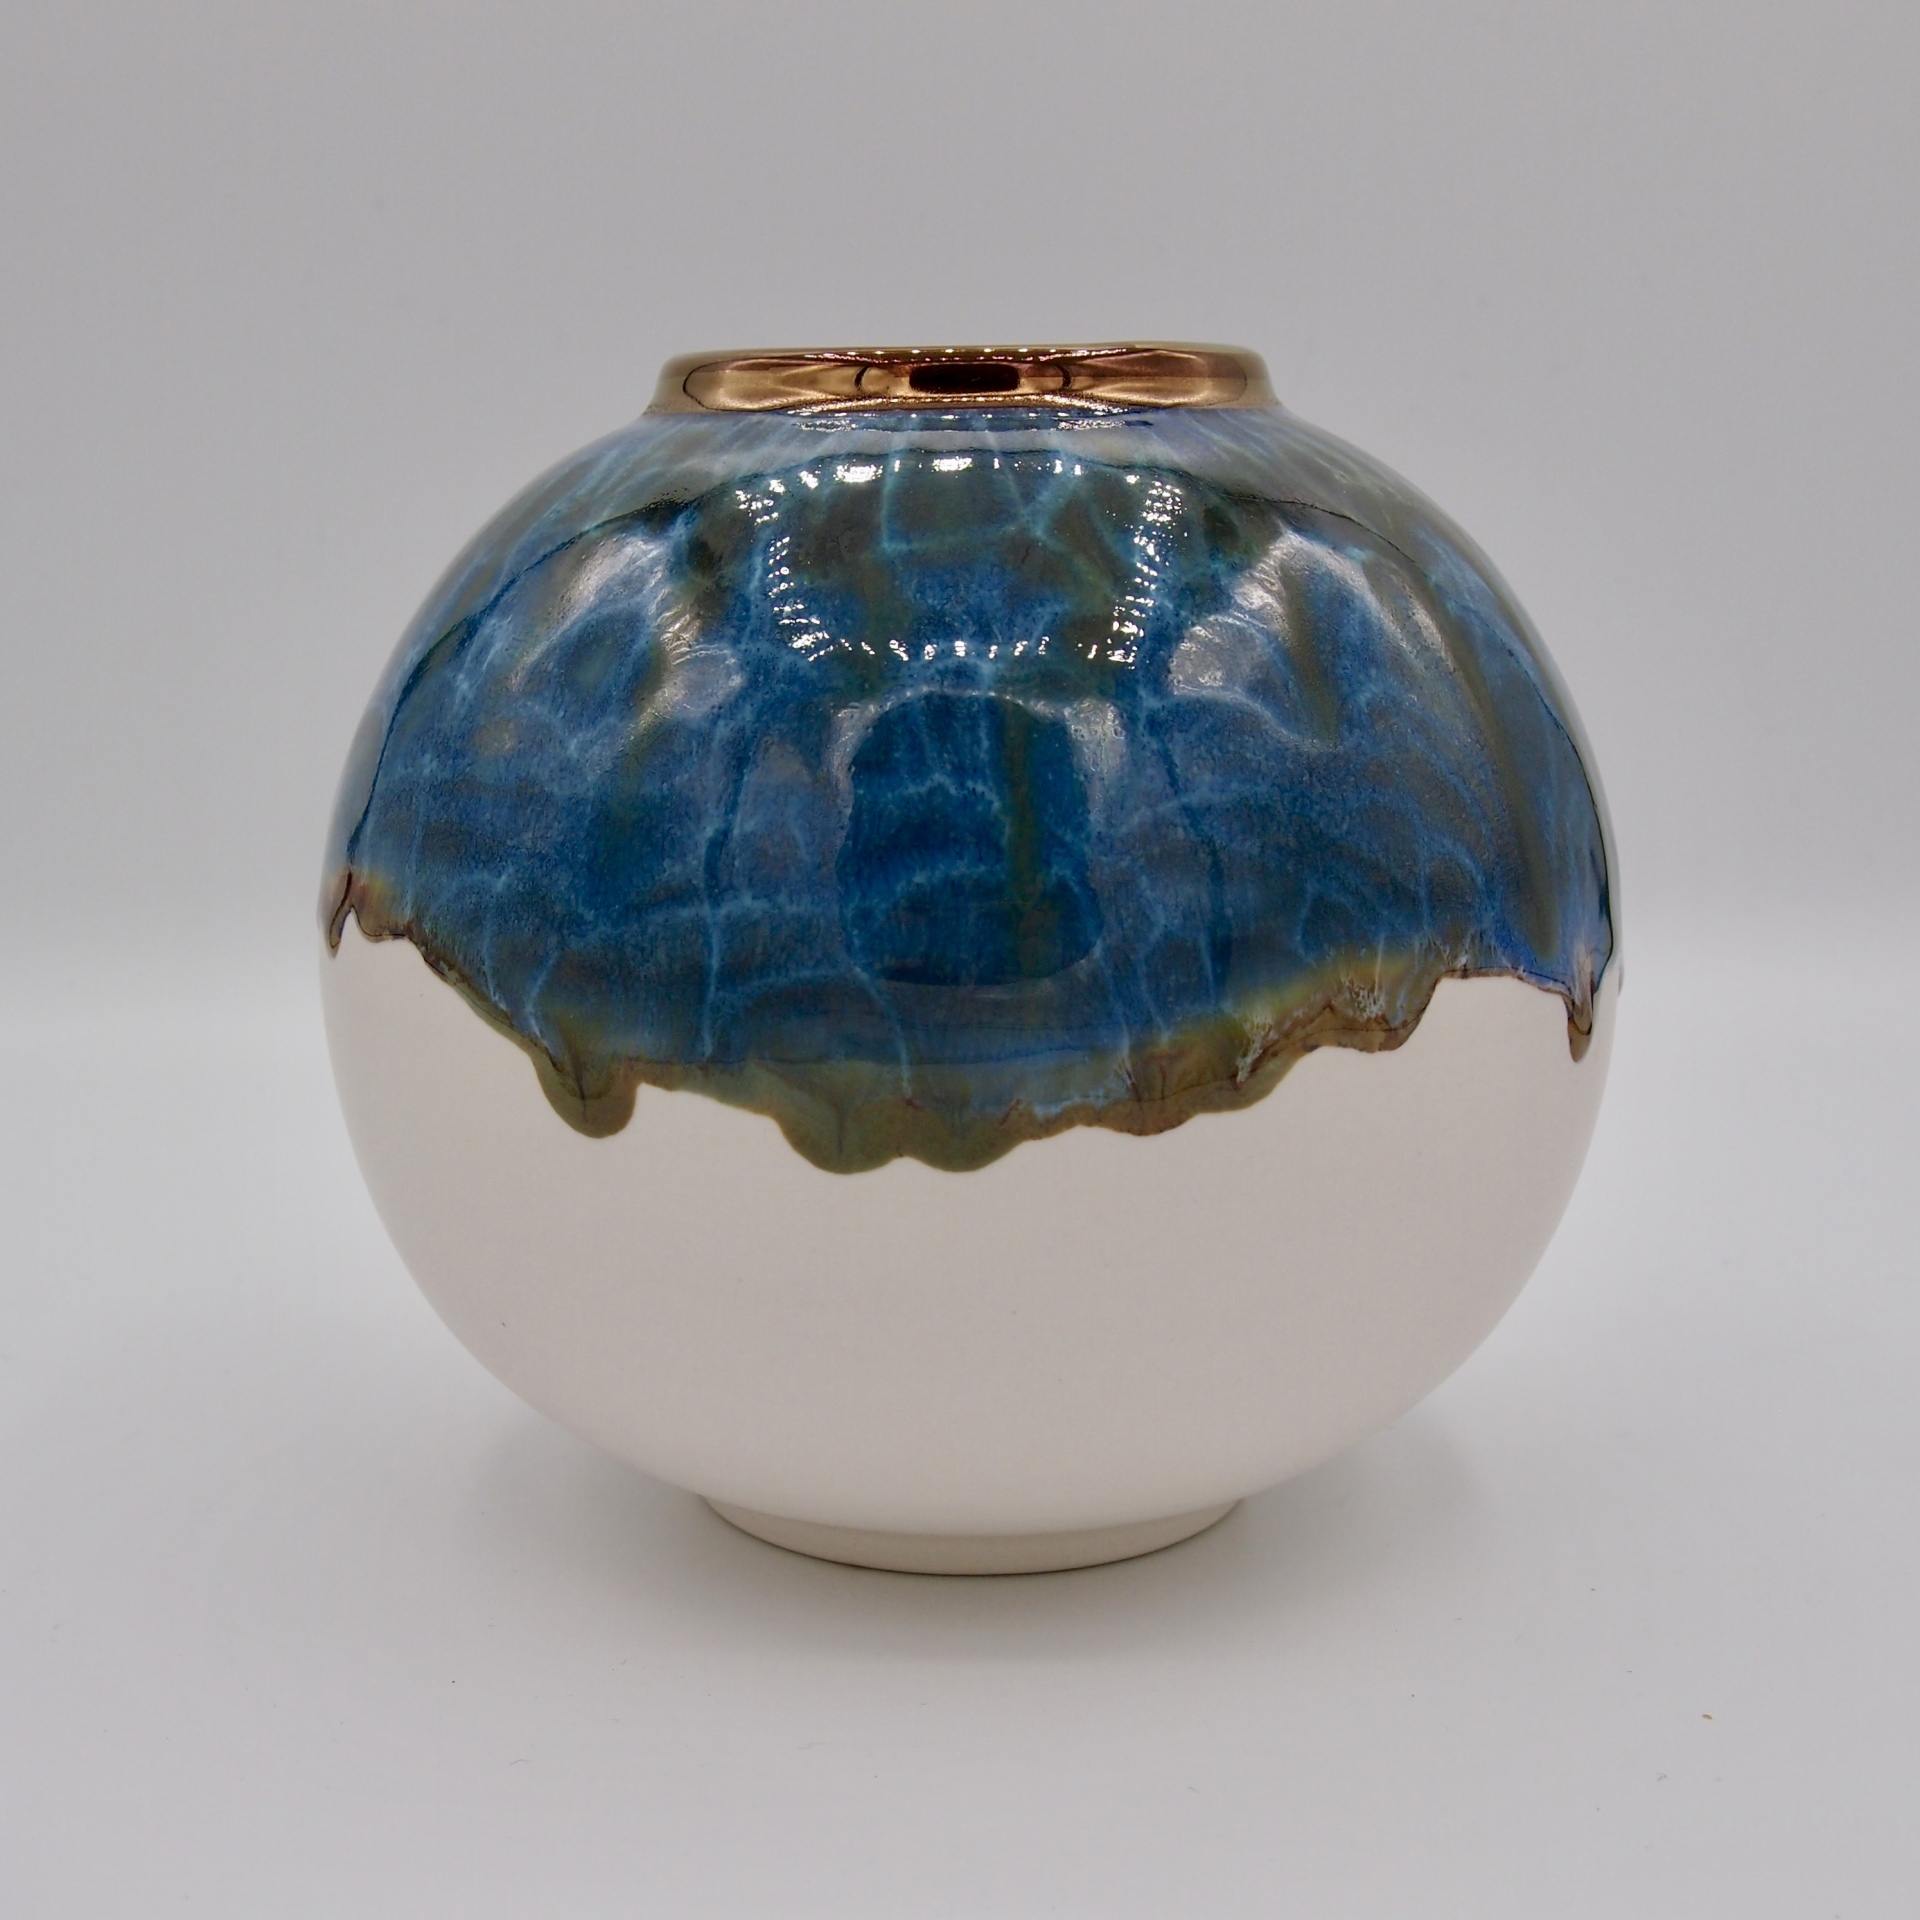 British UK United Kingdom Wales Ceramic Artist Studio Potter Sea Globe Pembrokeshire Coast National Park